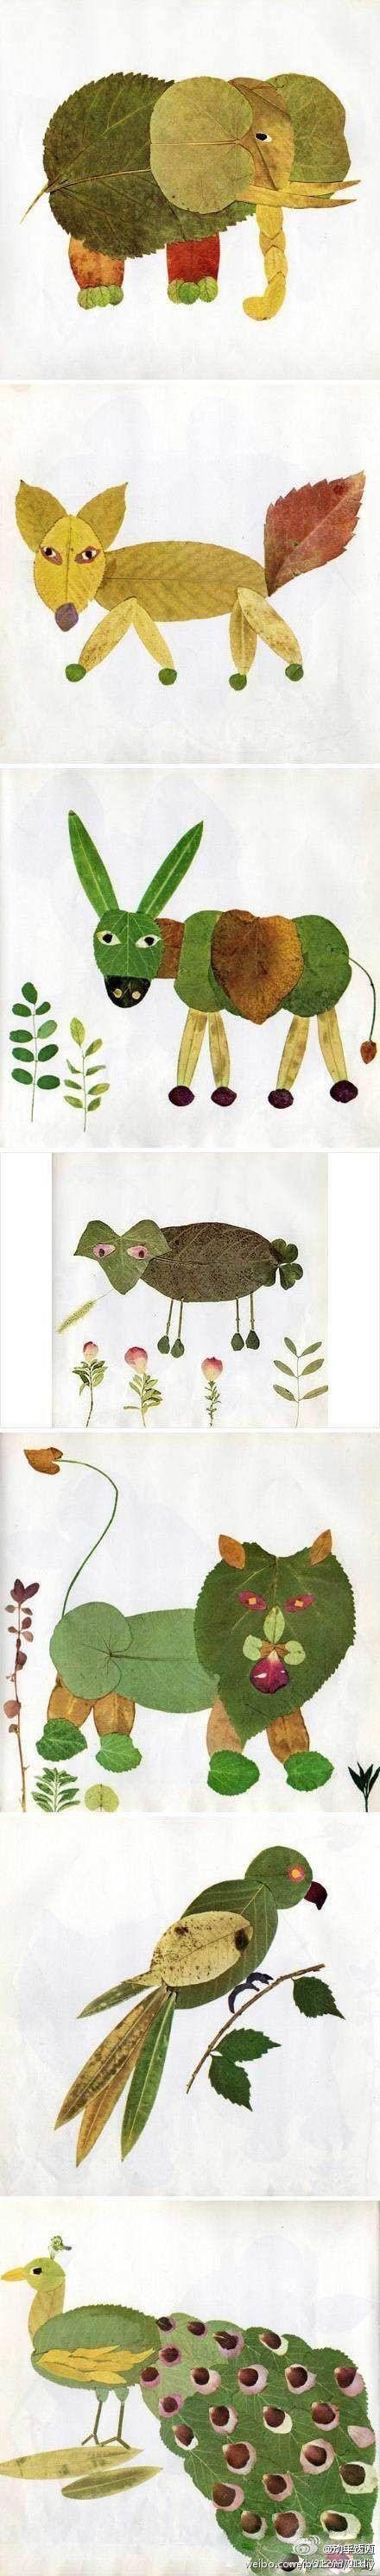 creative kids - leaf animals